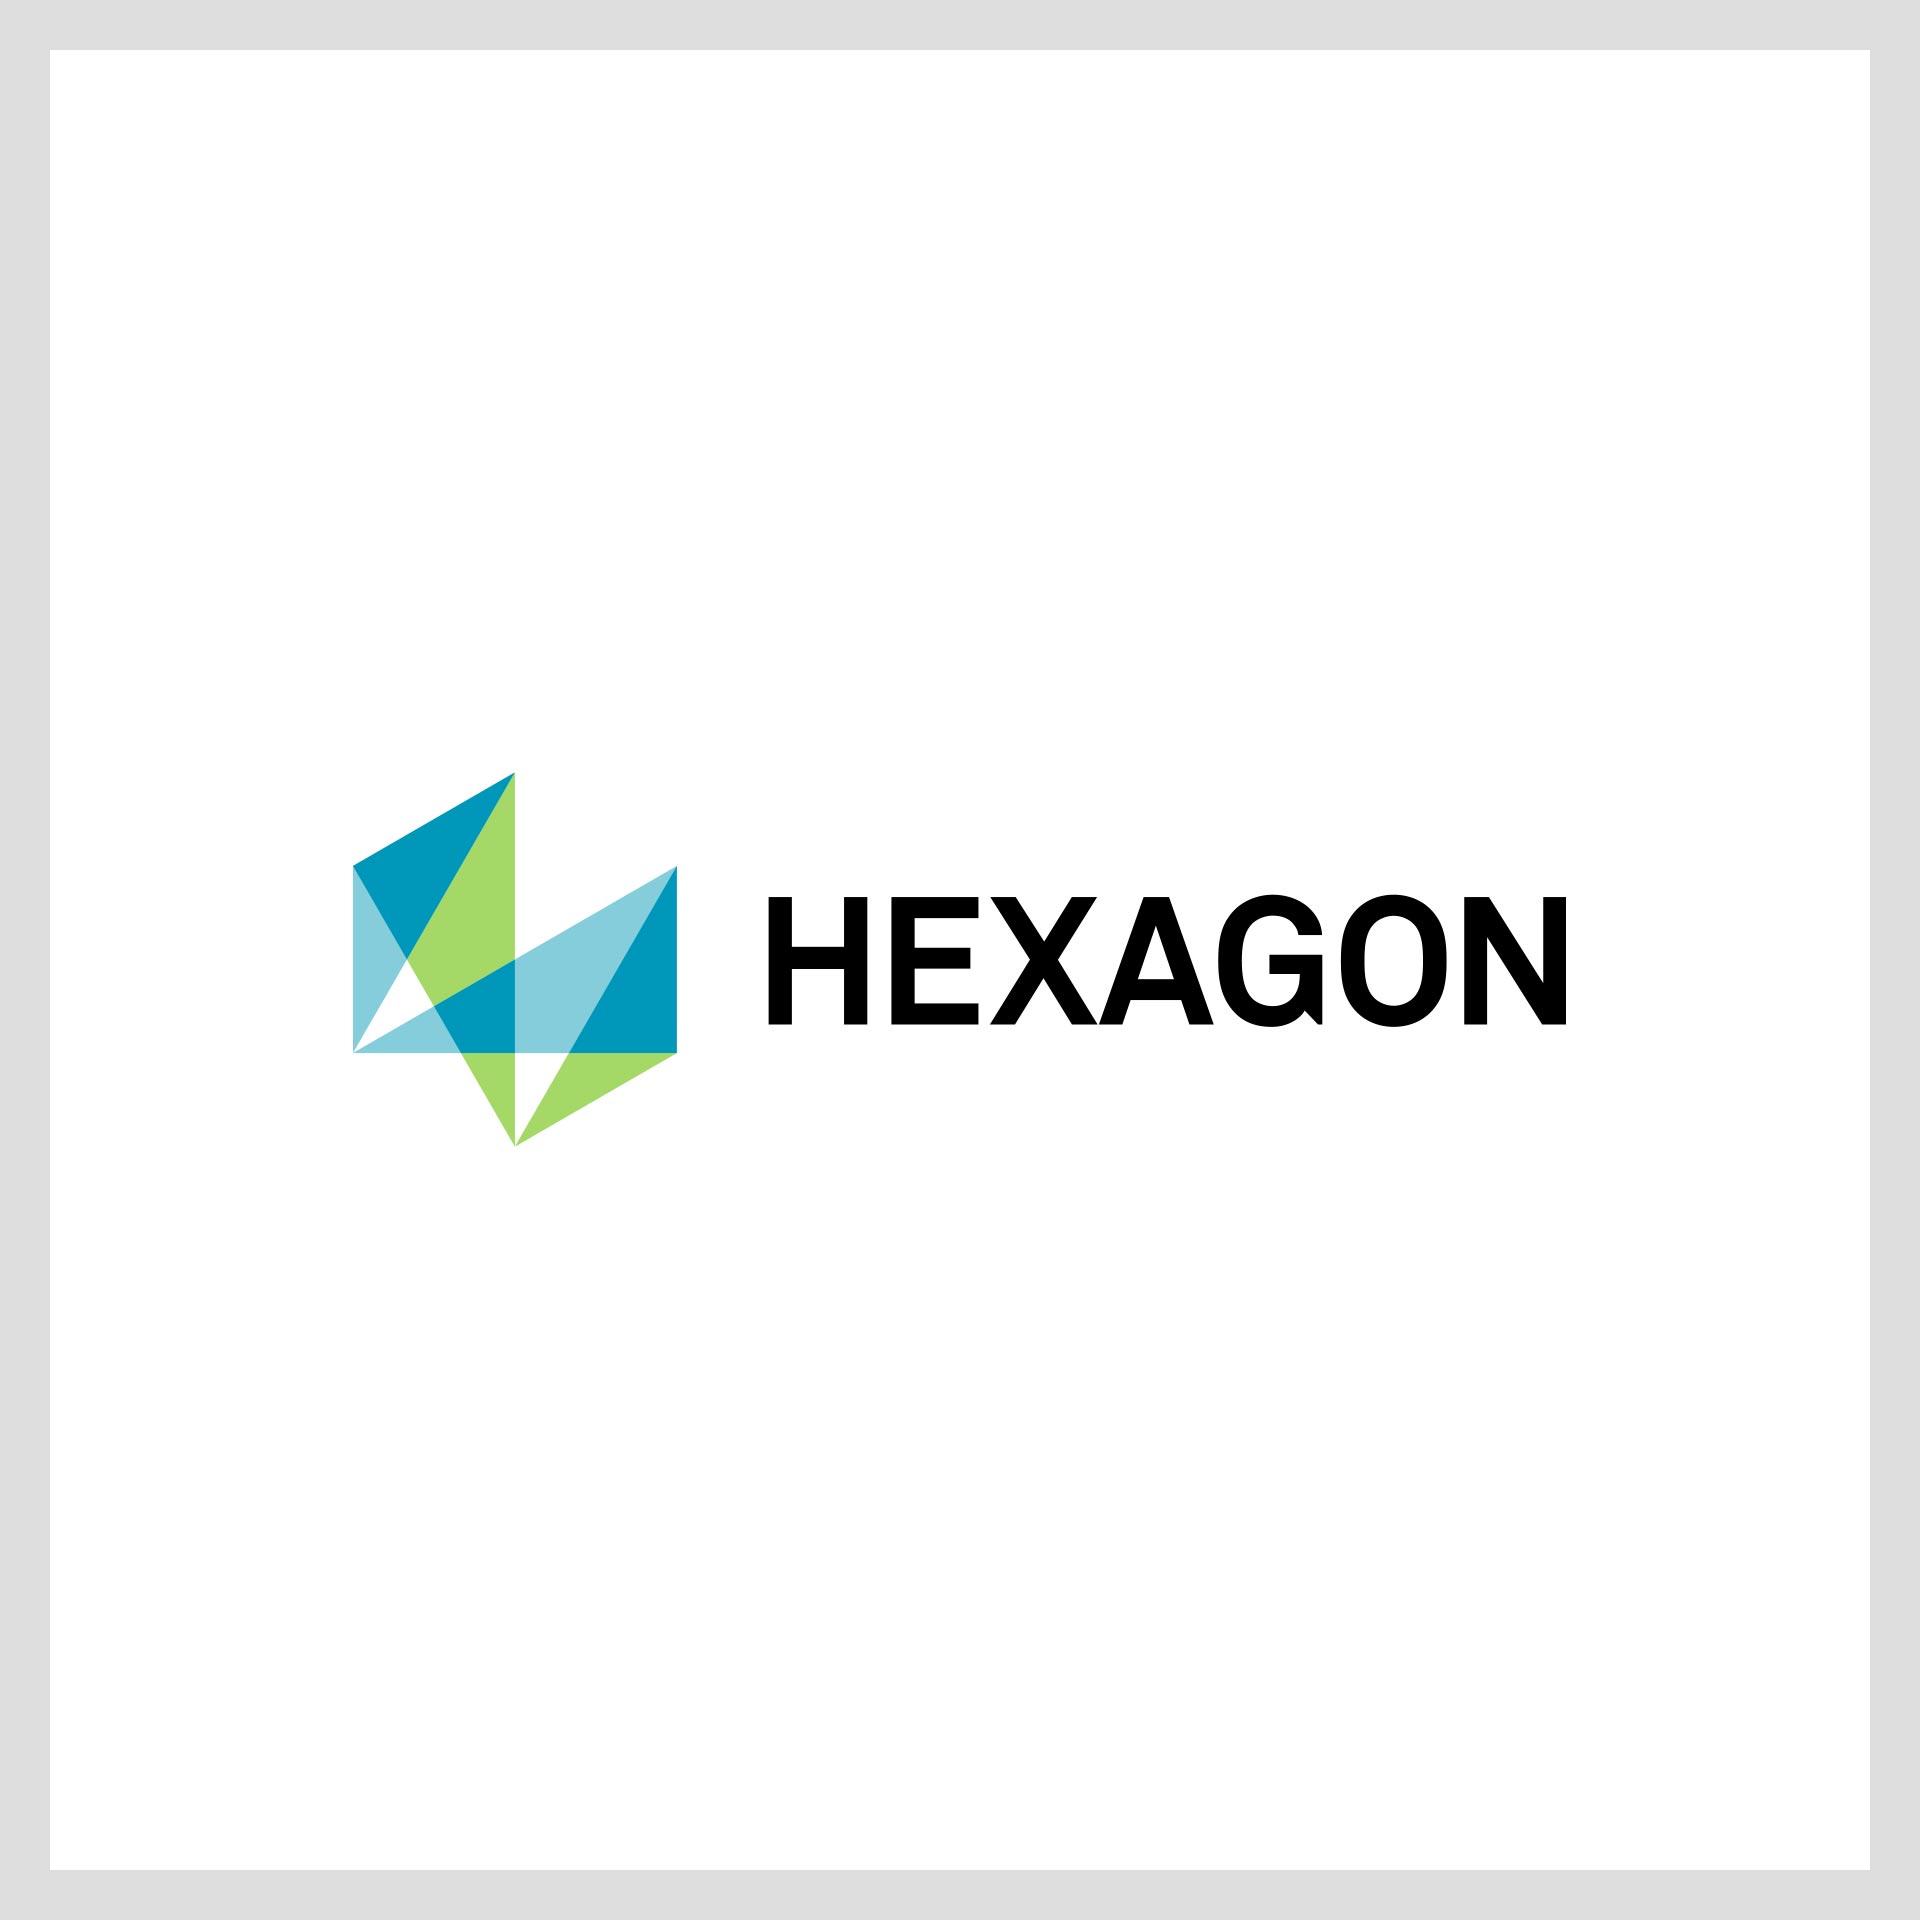 Hexagon technologie